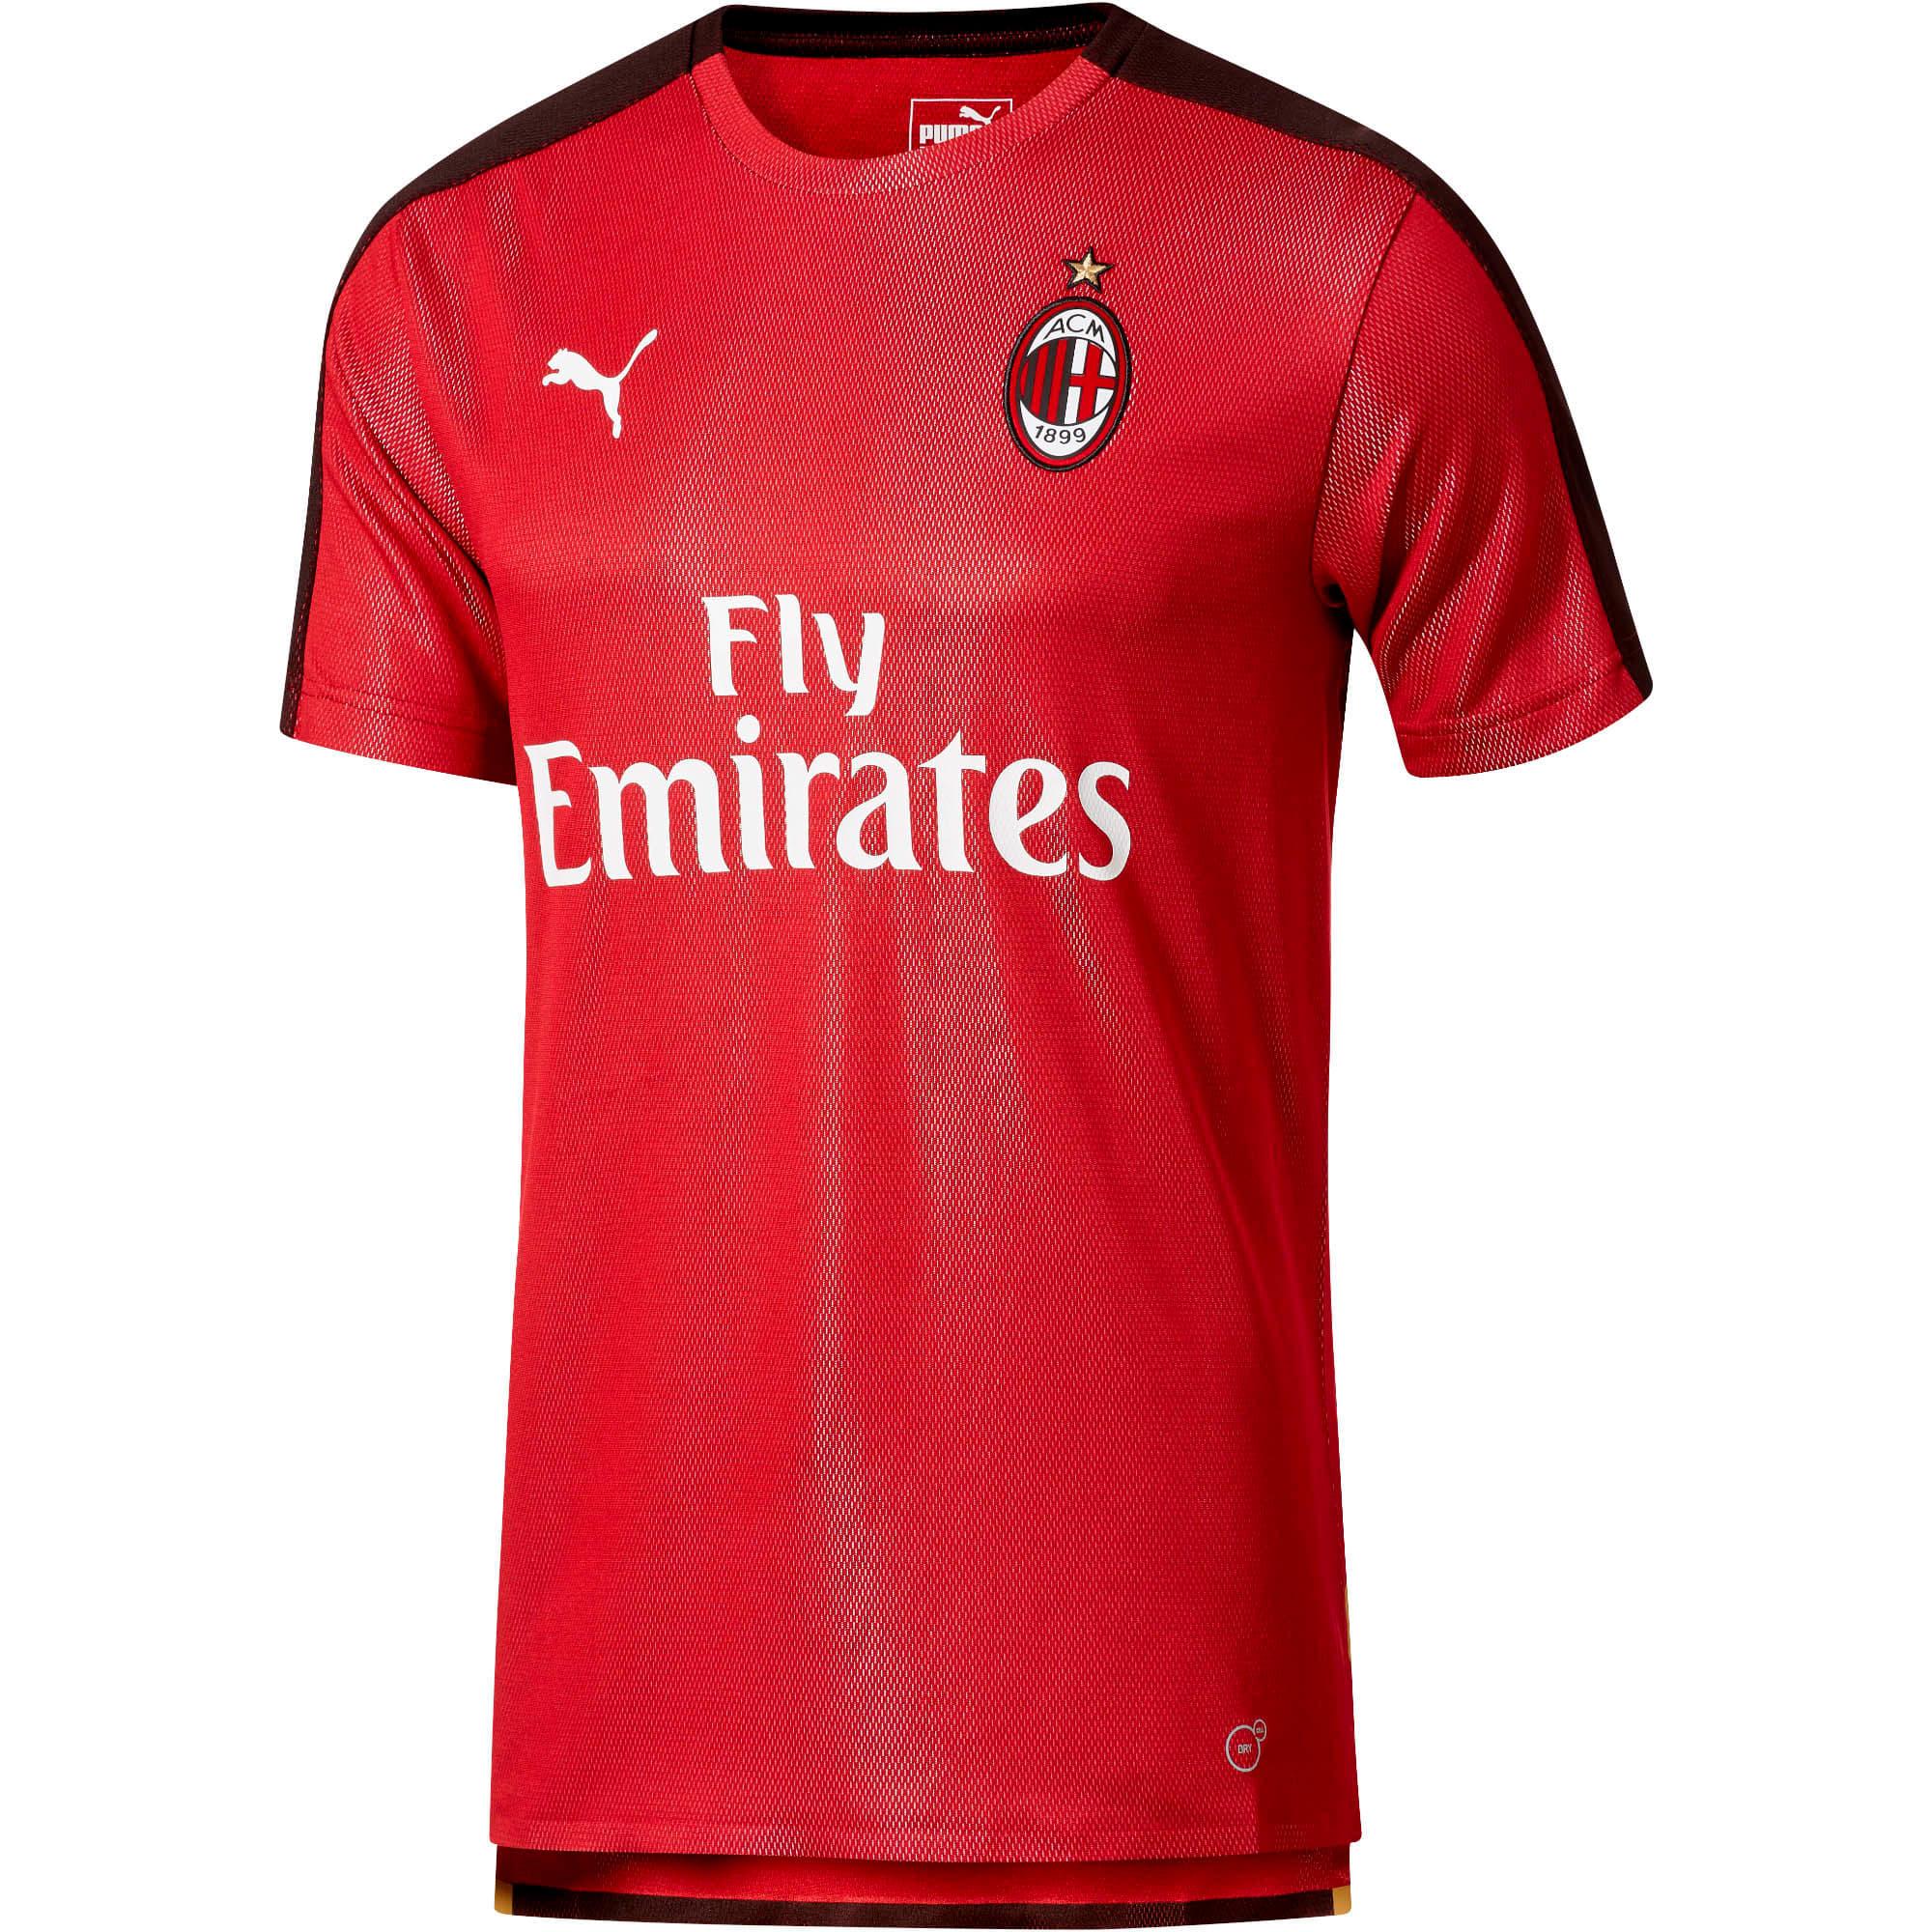 Thumbnail 1 of AC Milan Men's Stadium Jersey, Chili Pepper-Puma Black, medium